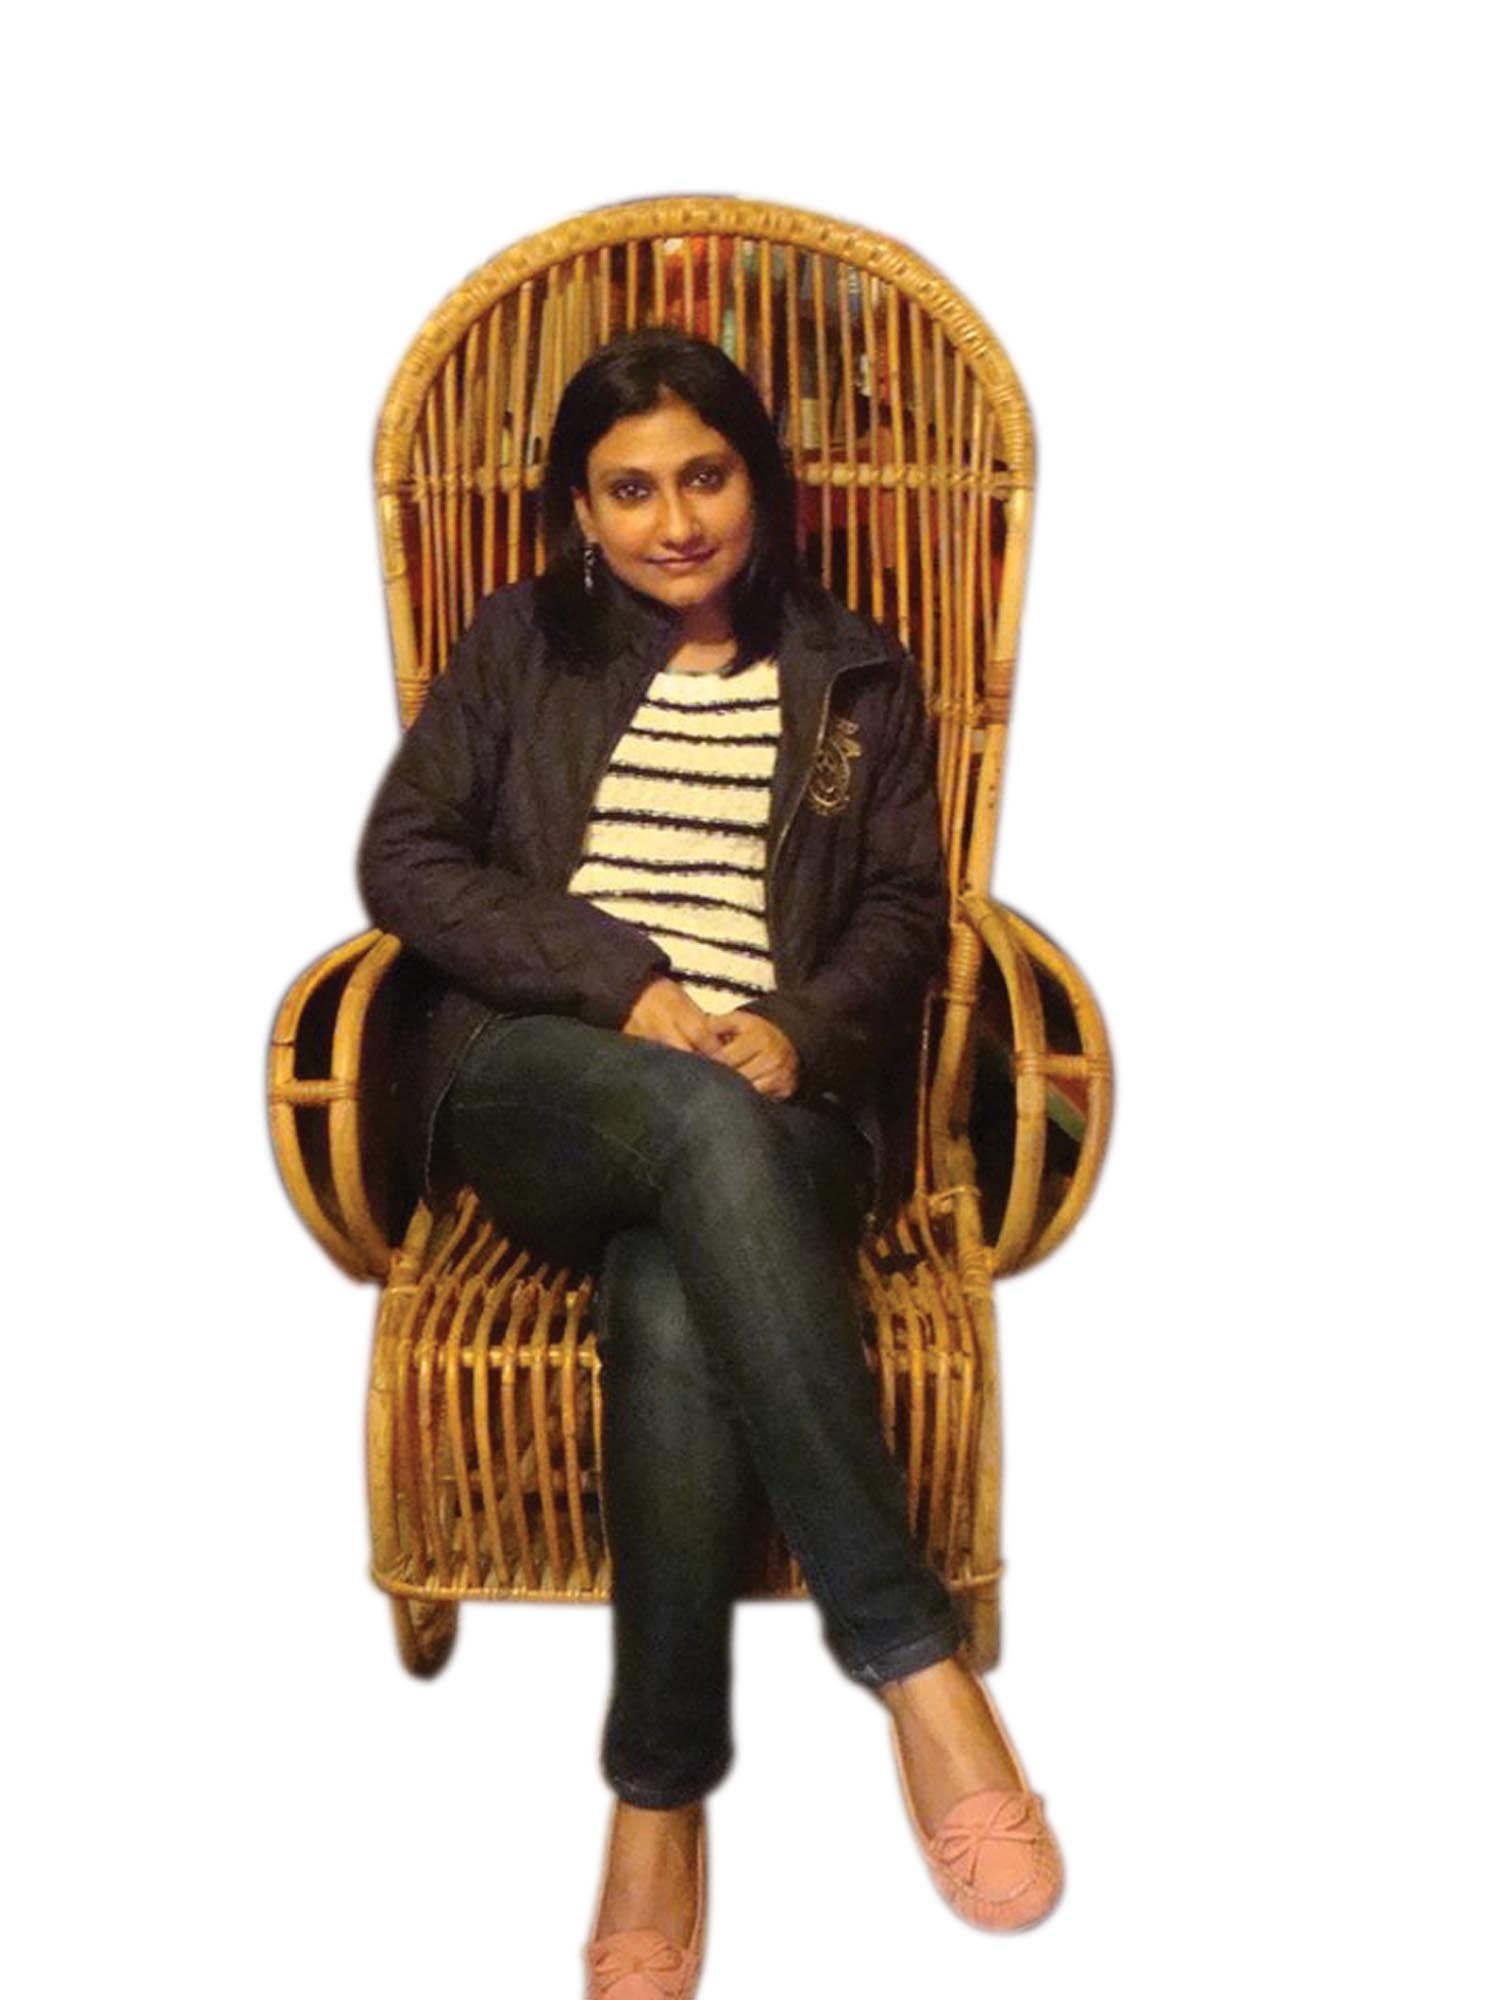 Minakshi Thakur